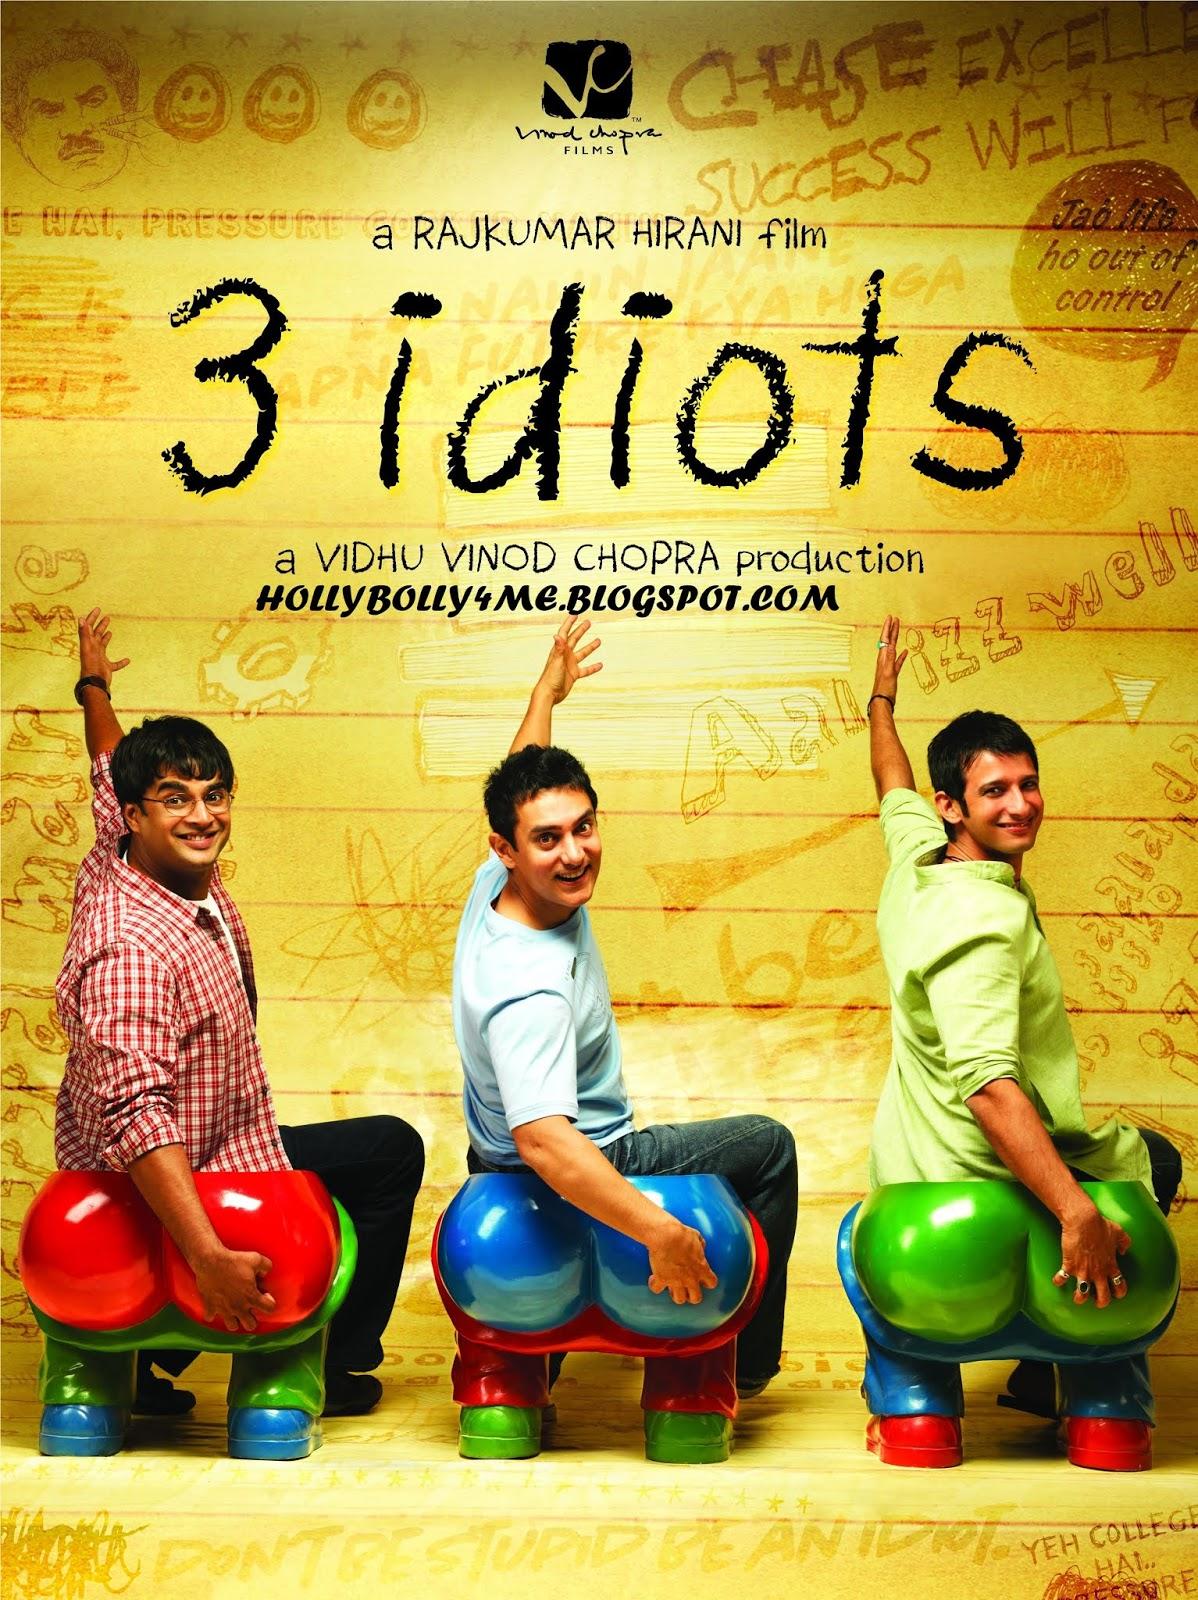 idiot movie ringtones free download mobile